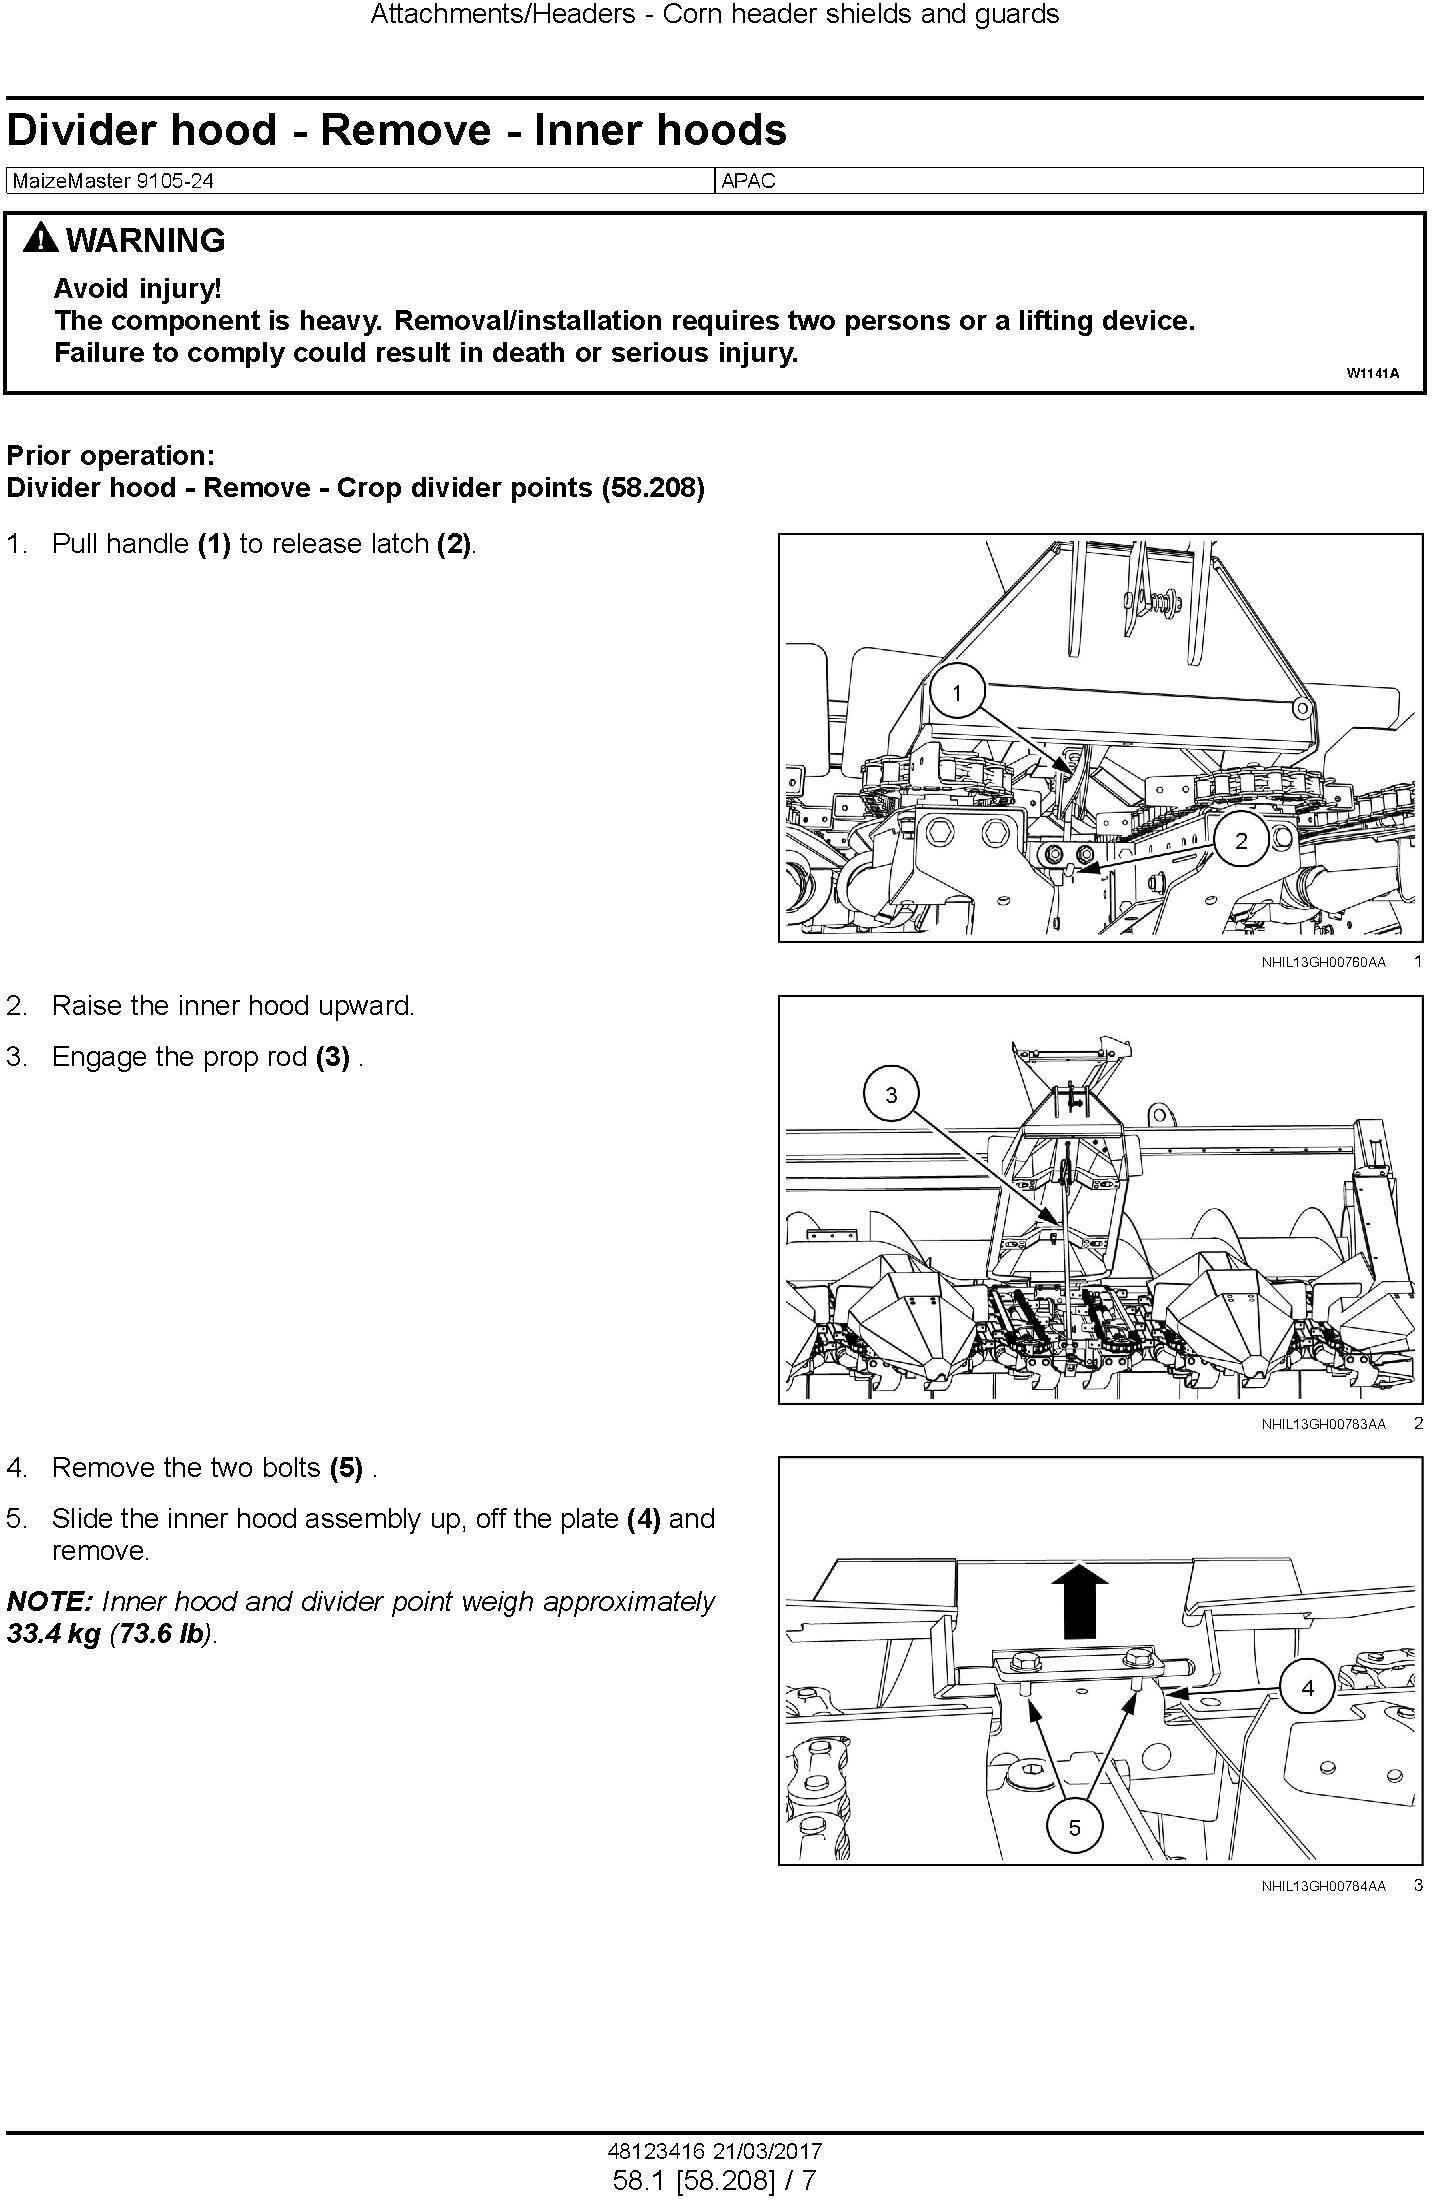 New Holland MaizeMaster 9105-24 Corn header Service Manual - 2